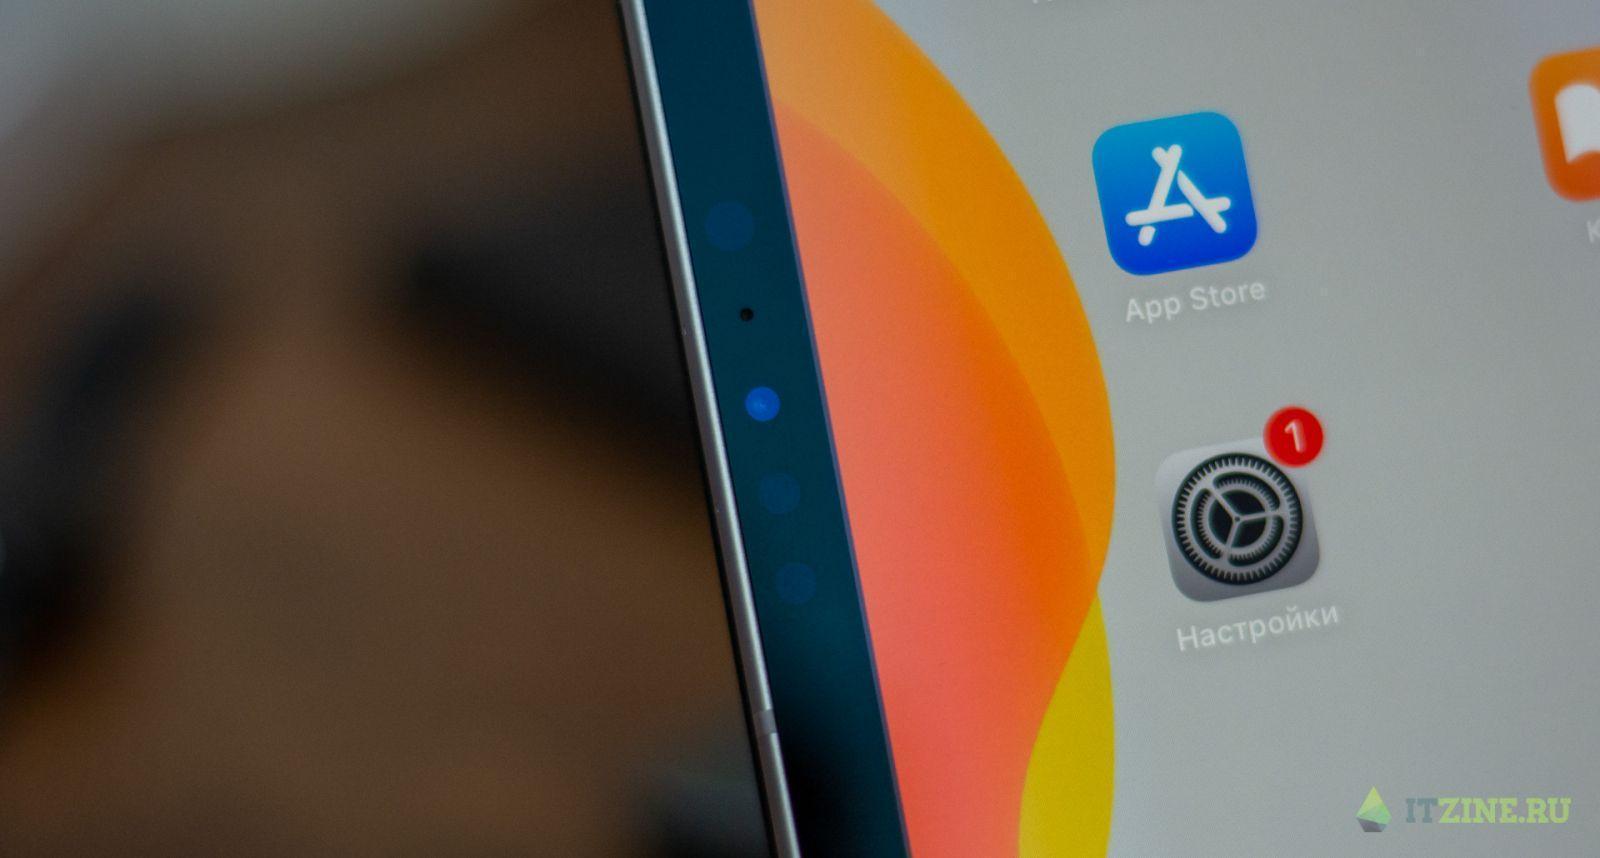 Дизайнерский рай. Обзор Apple iPad Pro 2020 + Apple Pencil + Magic Keyboard (dsc 8924)